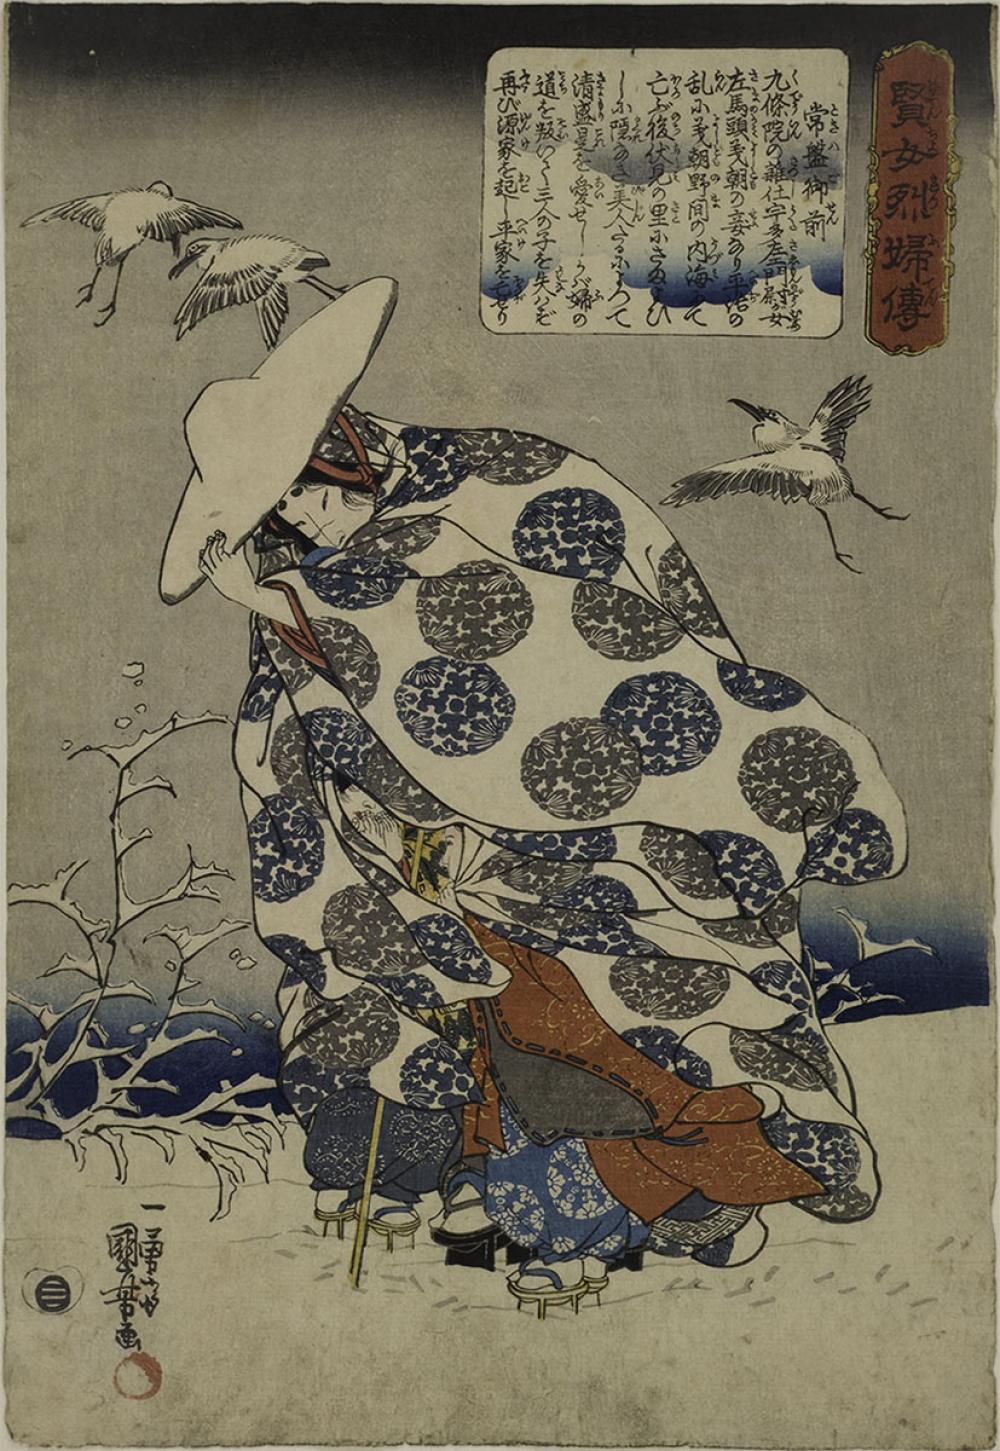 Utagawa Kuniyoshi, Tokiwa Gozen, from the series Kenjo reppu den